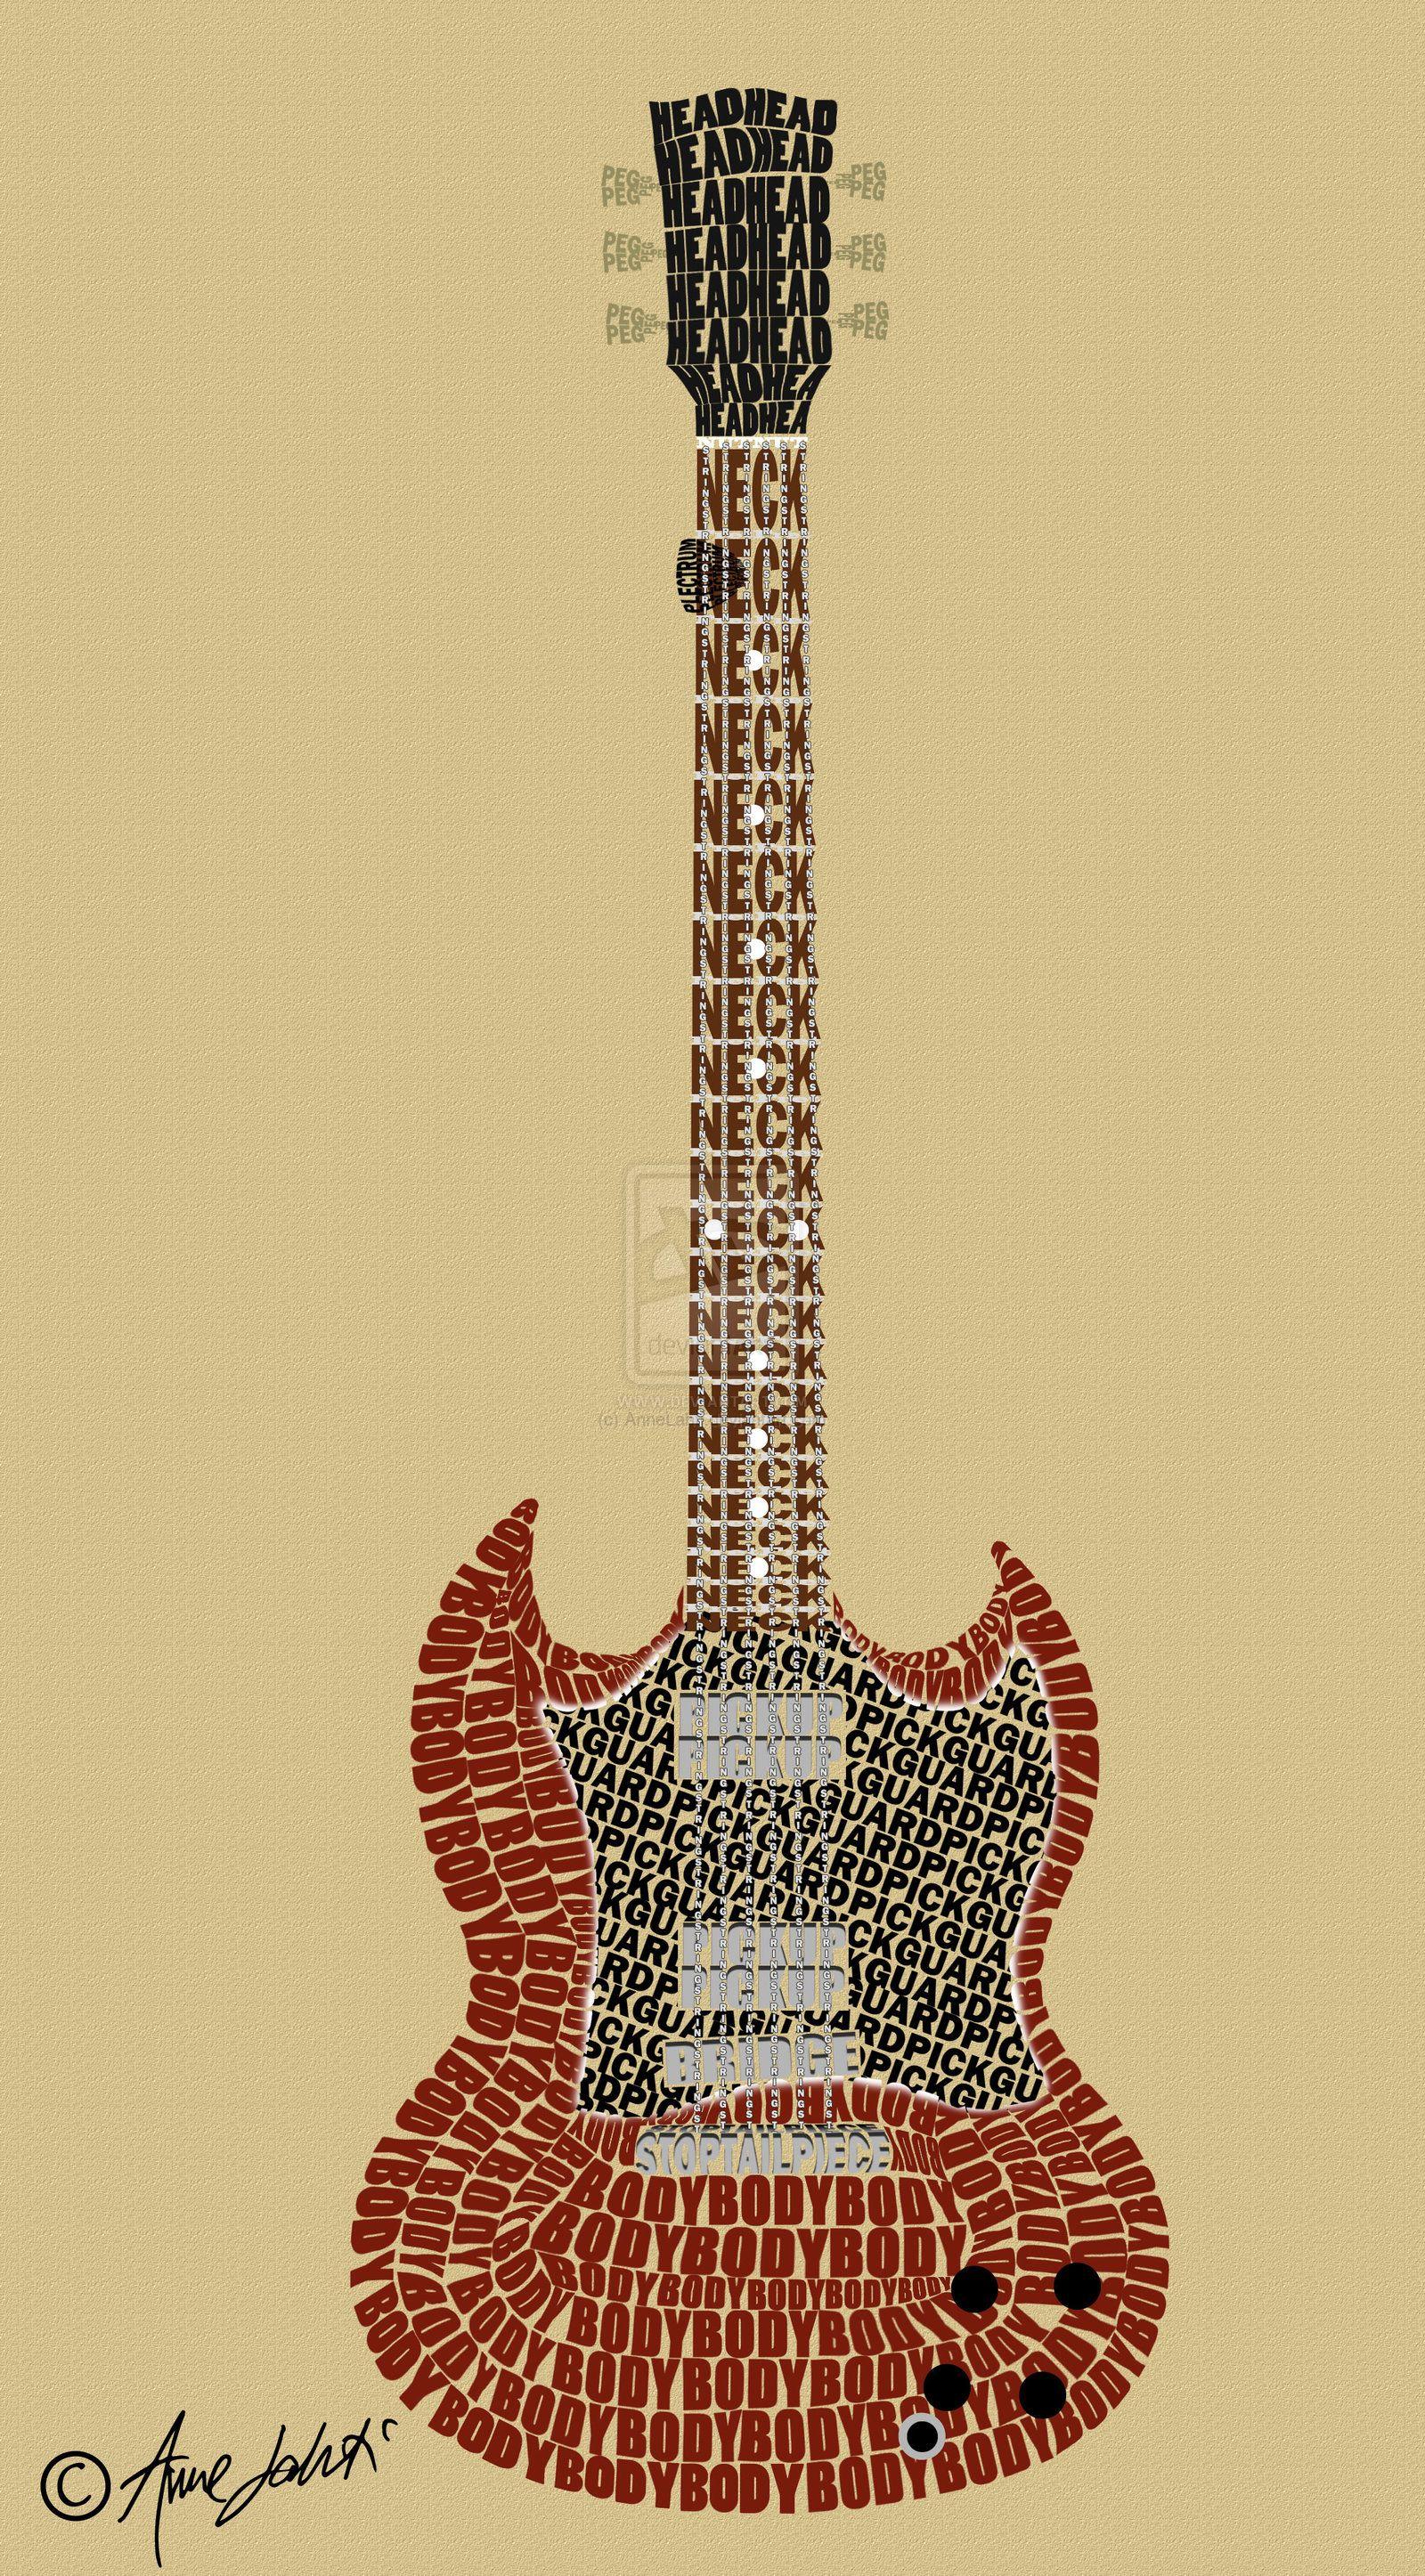 guitar anatomy typography art | Anatomy & Physiology | Pinterest ...